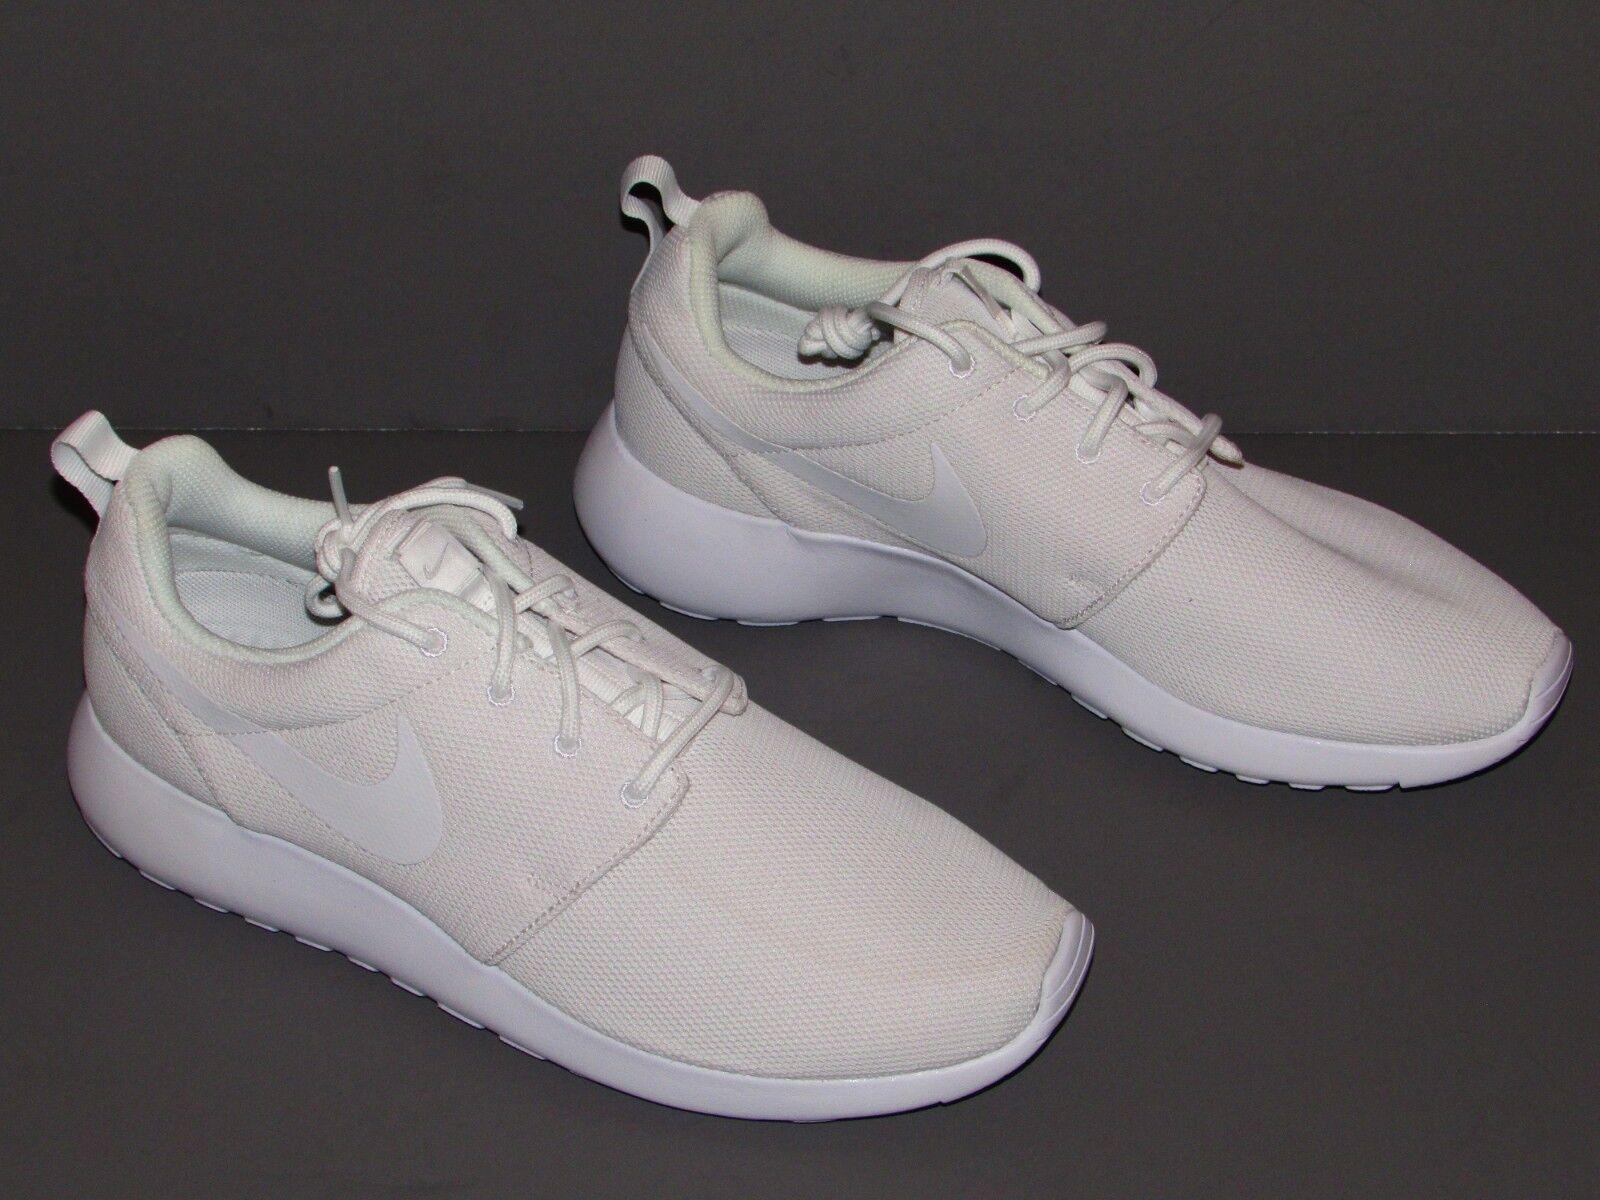 451c49272c90 Nike Roshe One Women s Shoes White pure Platinum 844994-100 Size US ...